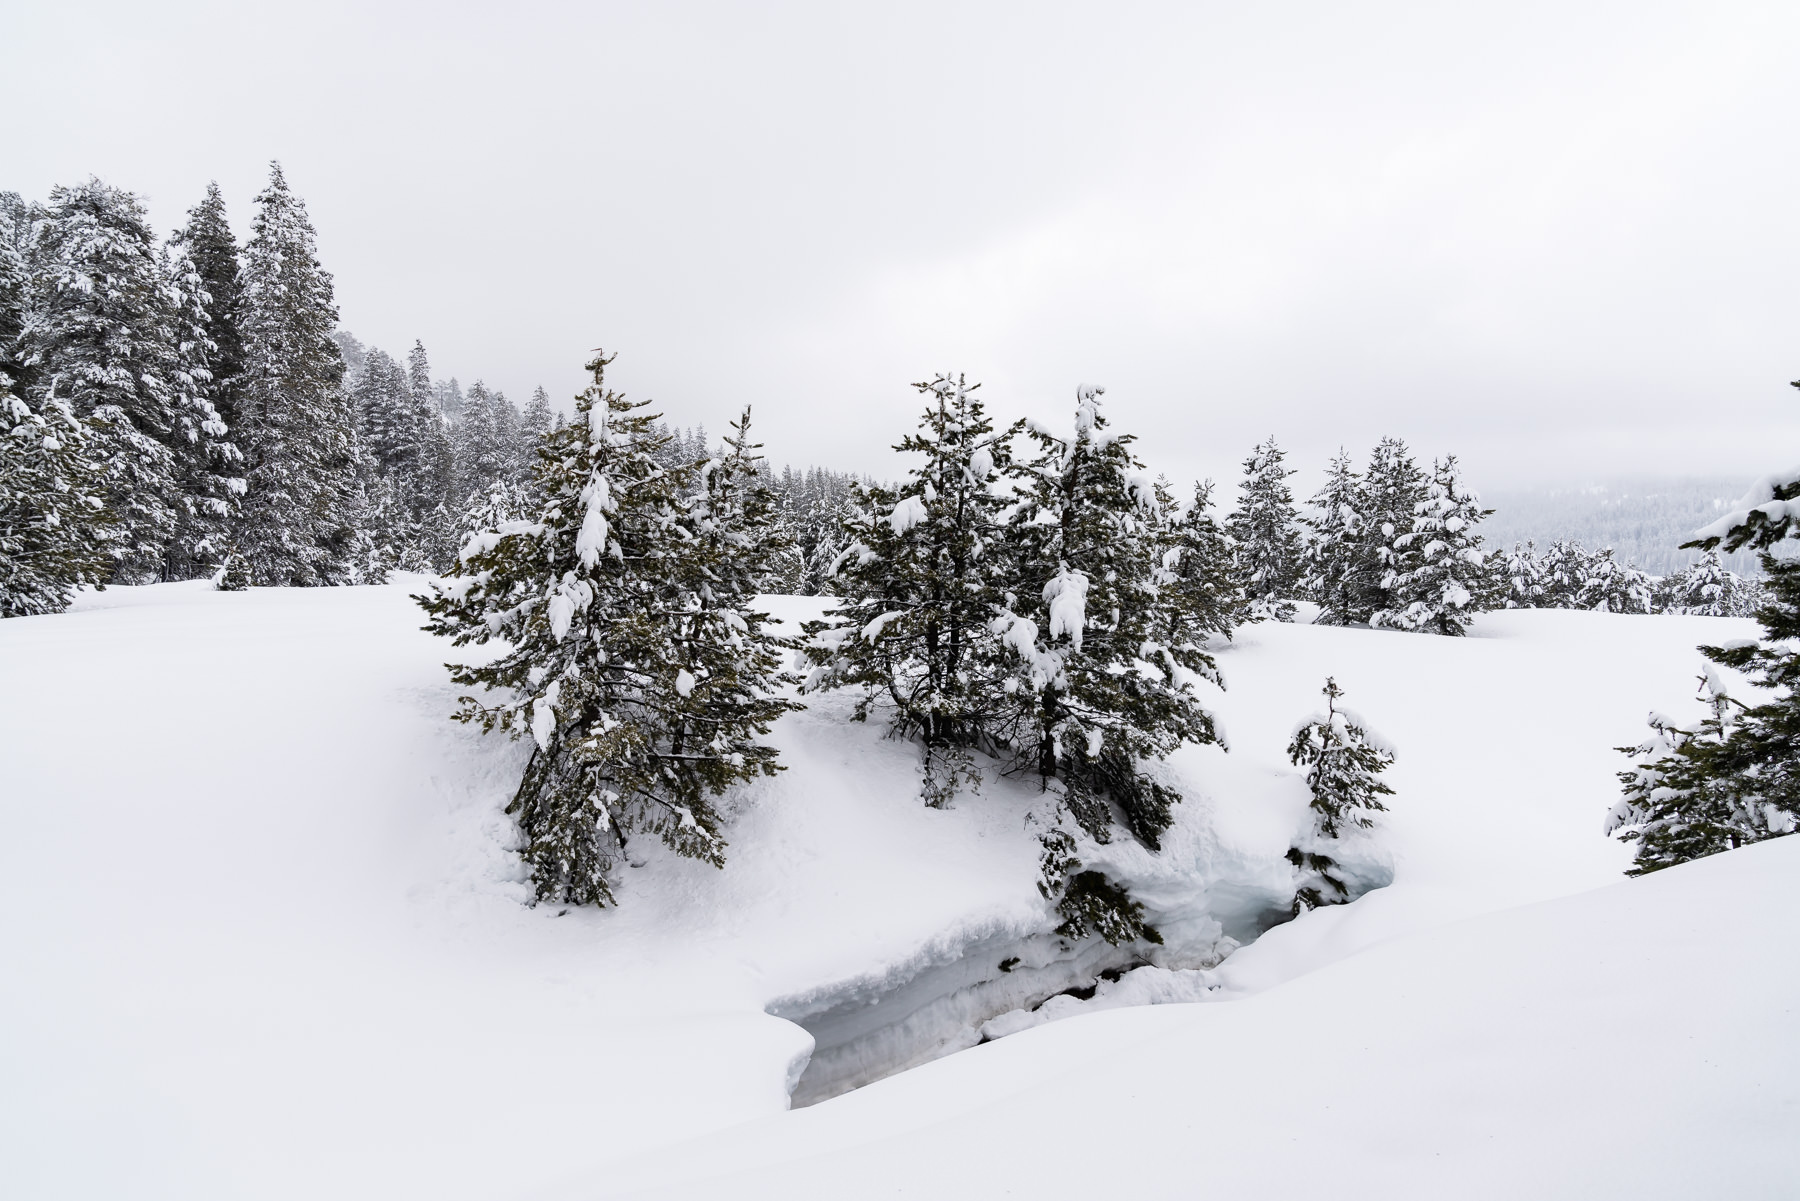 2019.03.23 Snowy Tahoe © Jennifer Carr Photography-16.jpg